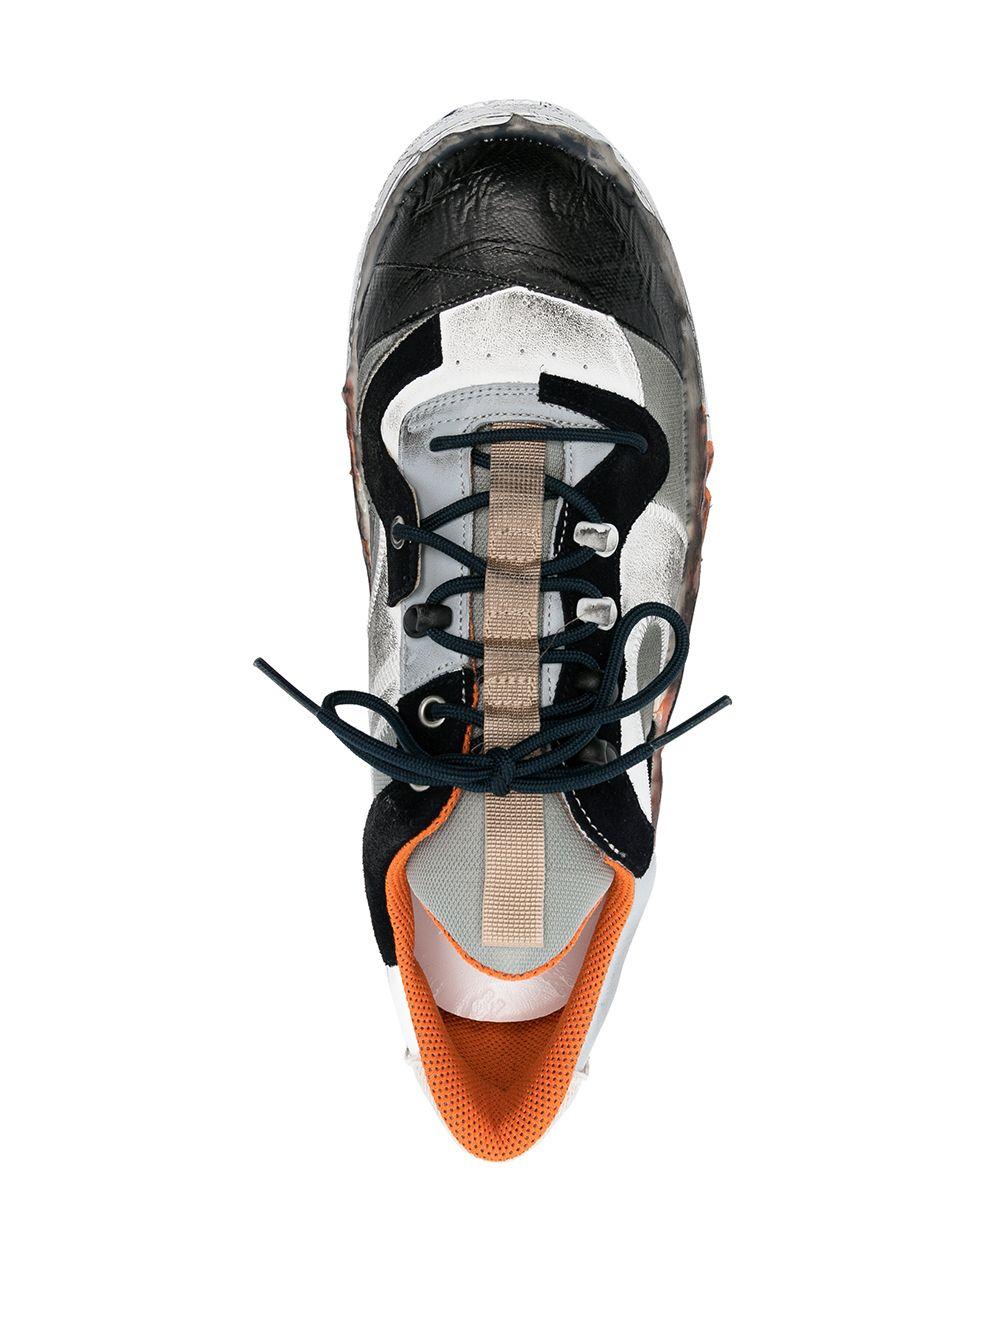 Maison Margiela sneakers fusion uomo MAISON MARGIELA   Sneakers   S57WS0383 P4023H8589